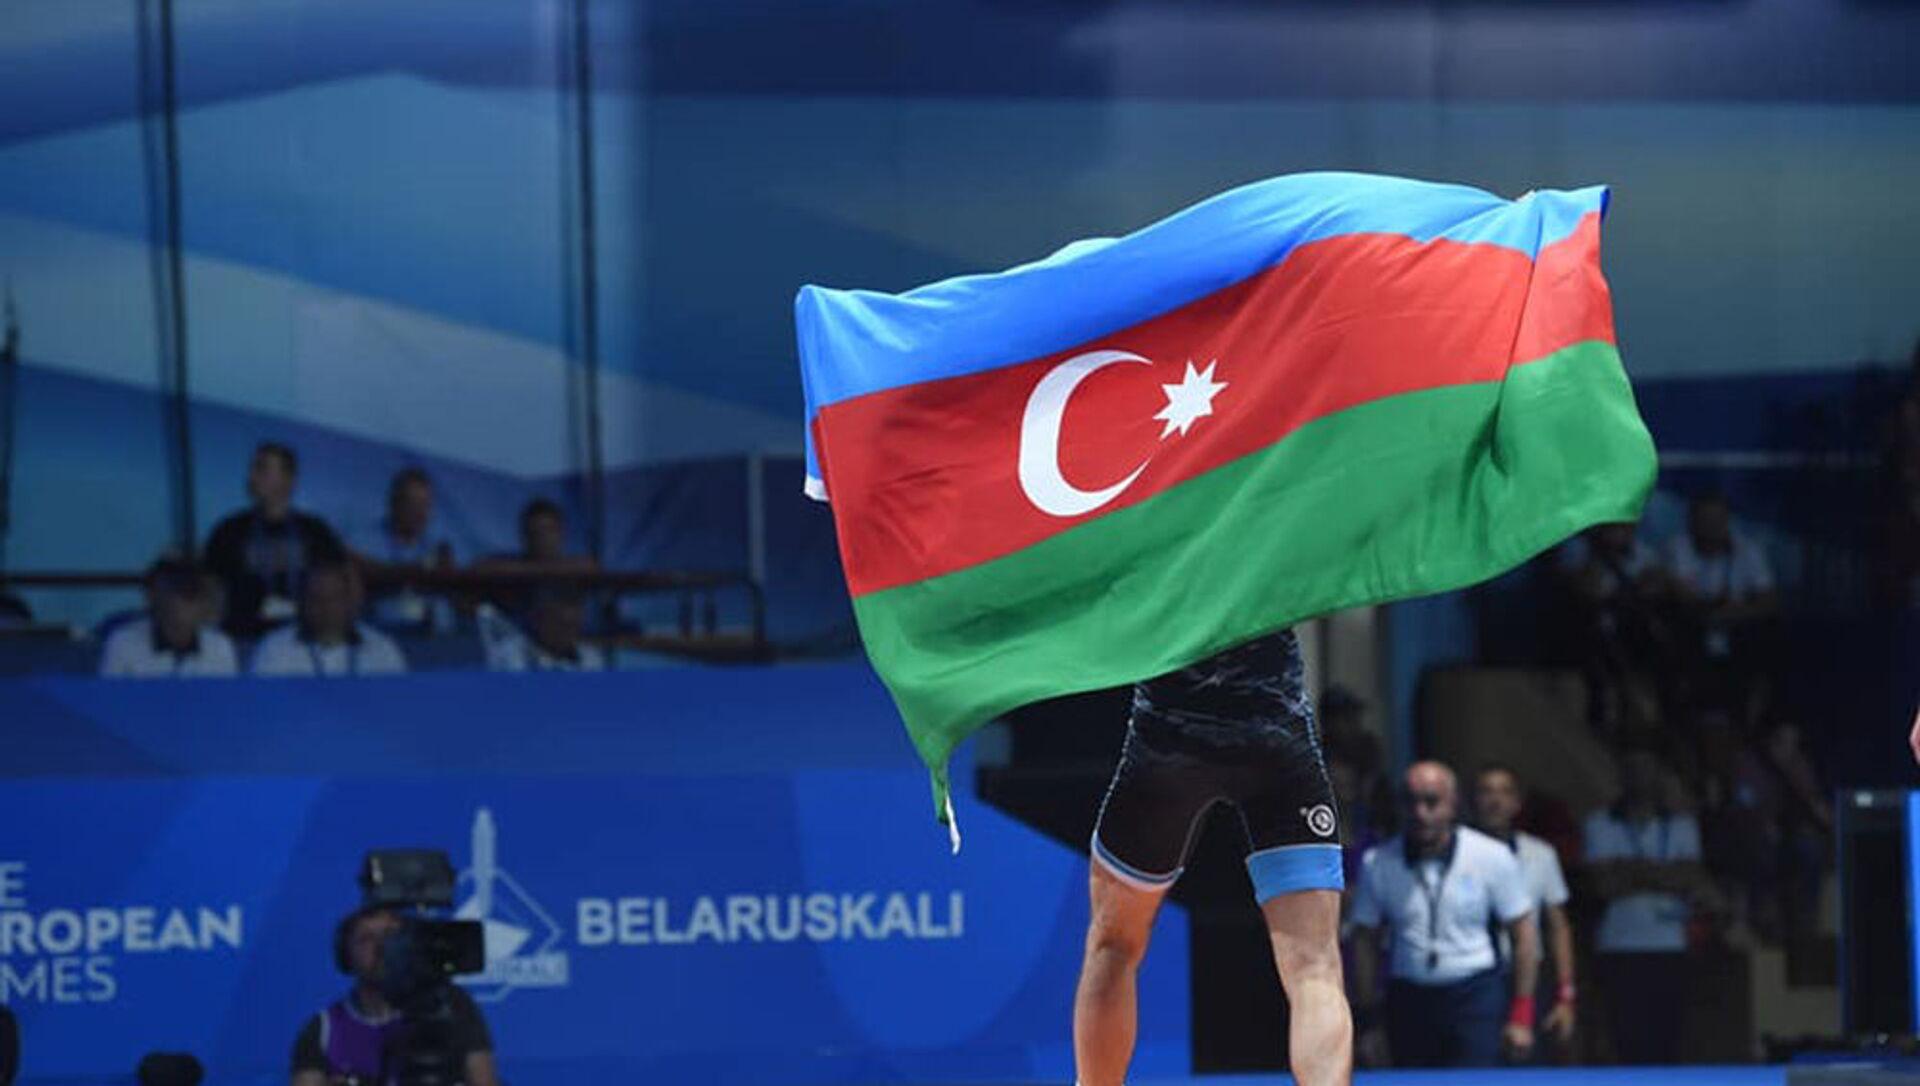 Азербайджанский борец, фото из архива - Sputnik Азербайджан, 1920, 20.08.2021